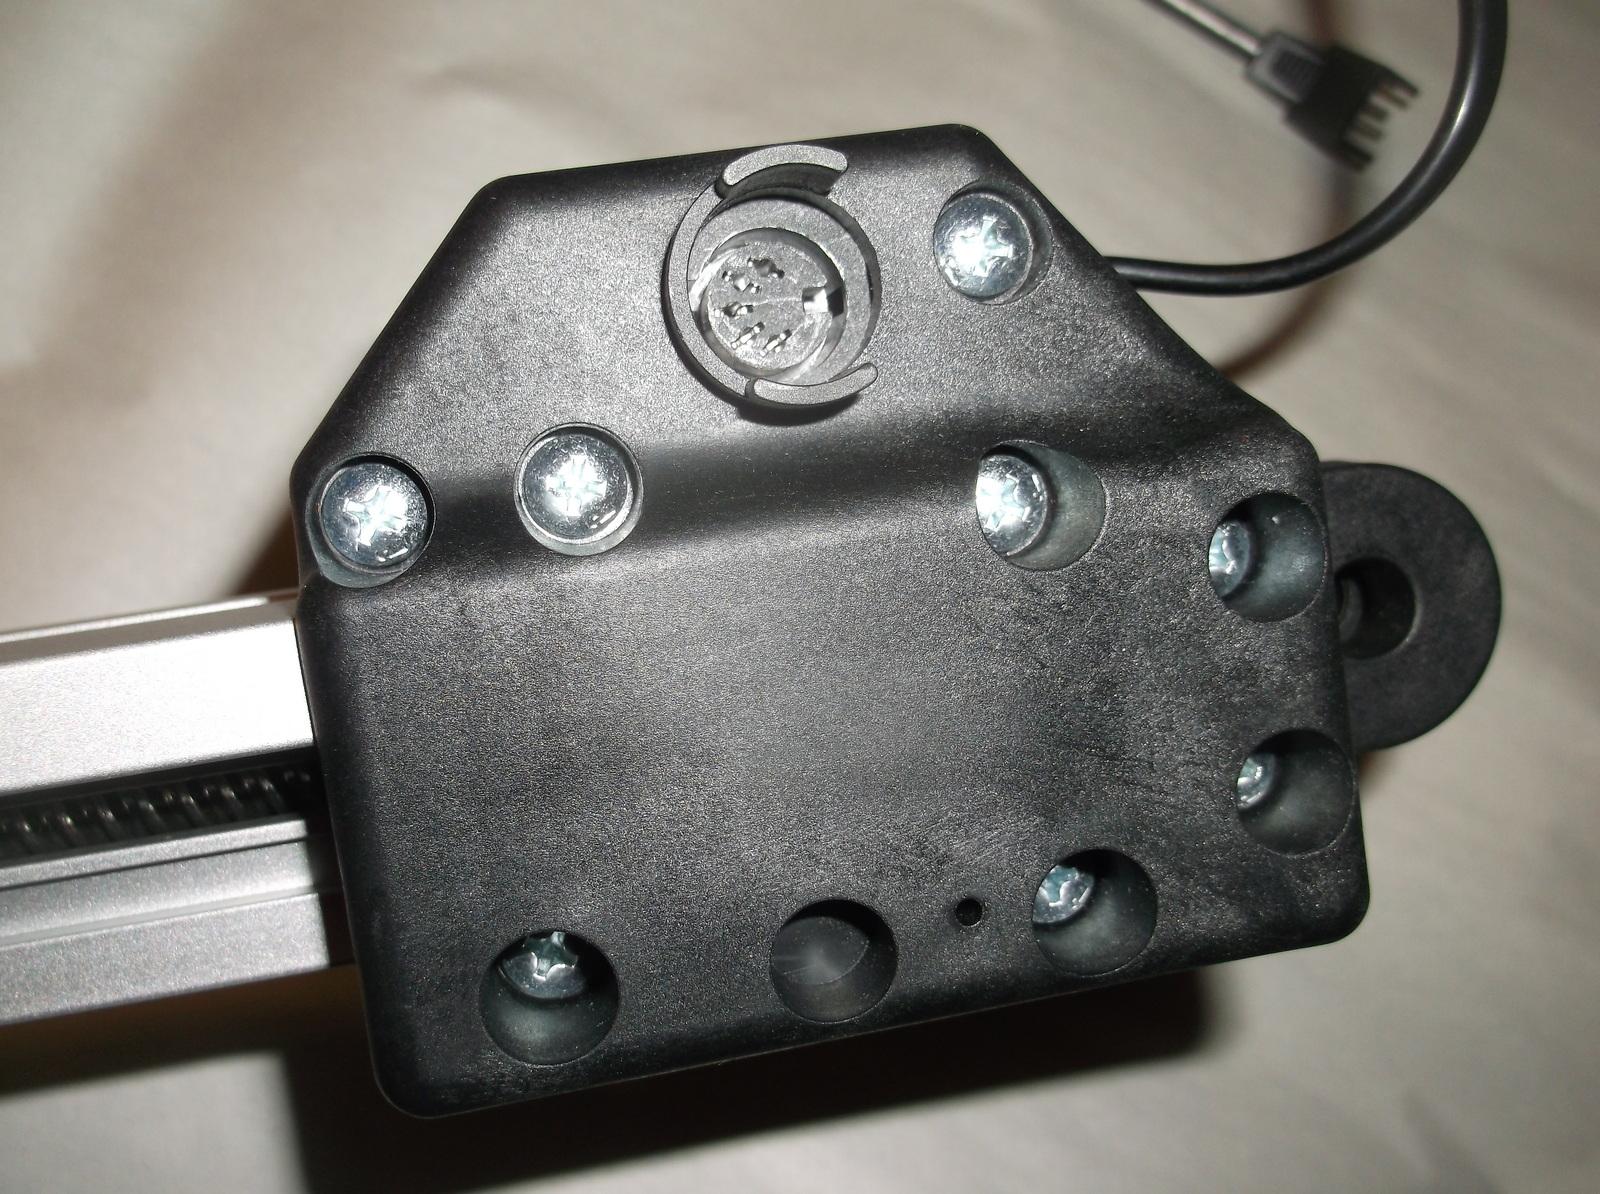 Okin Jldq 11 Motor Of Okin Refined R Linear Actuator Motor For Power Recliners